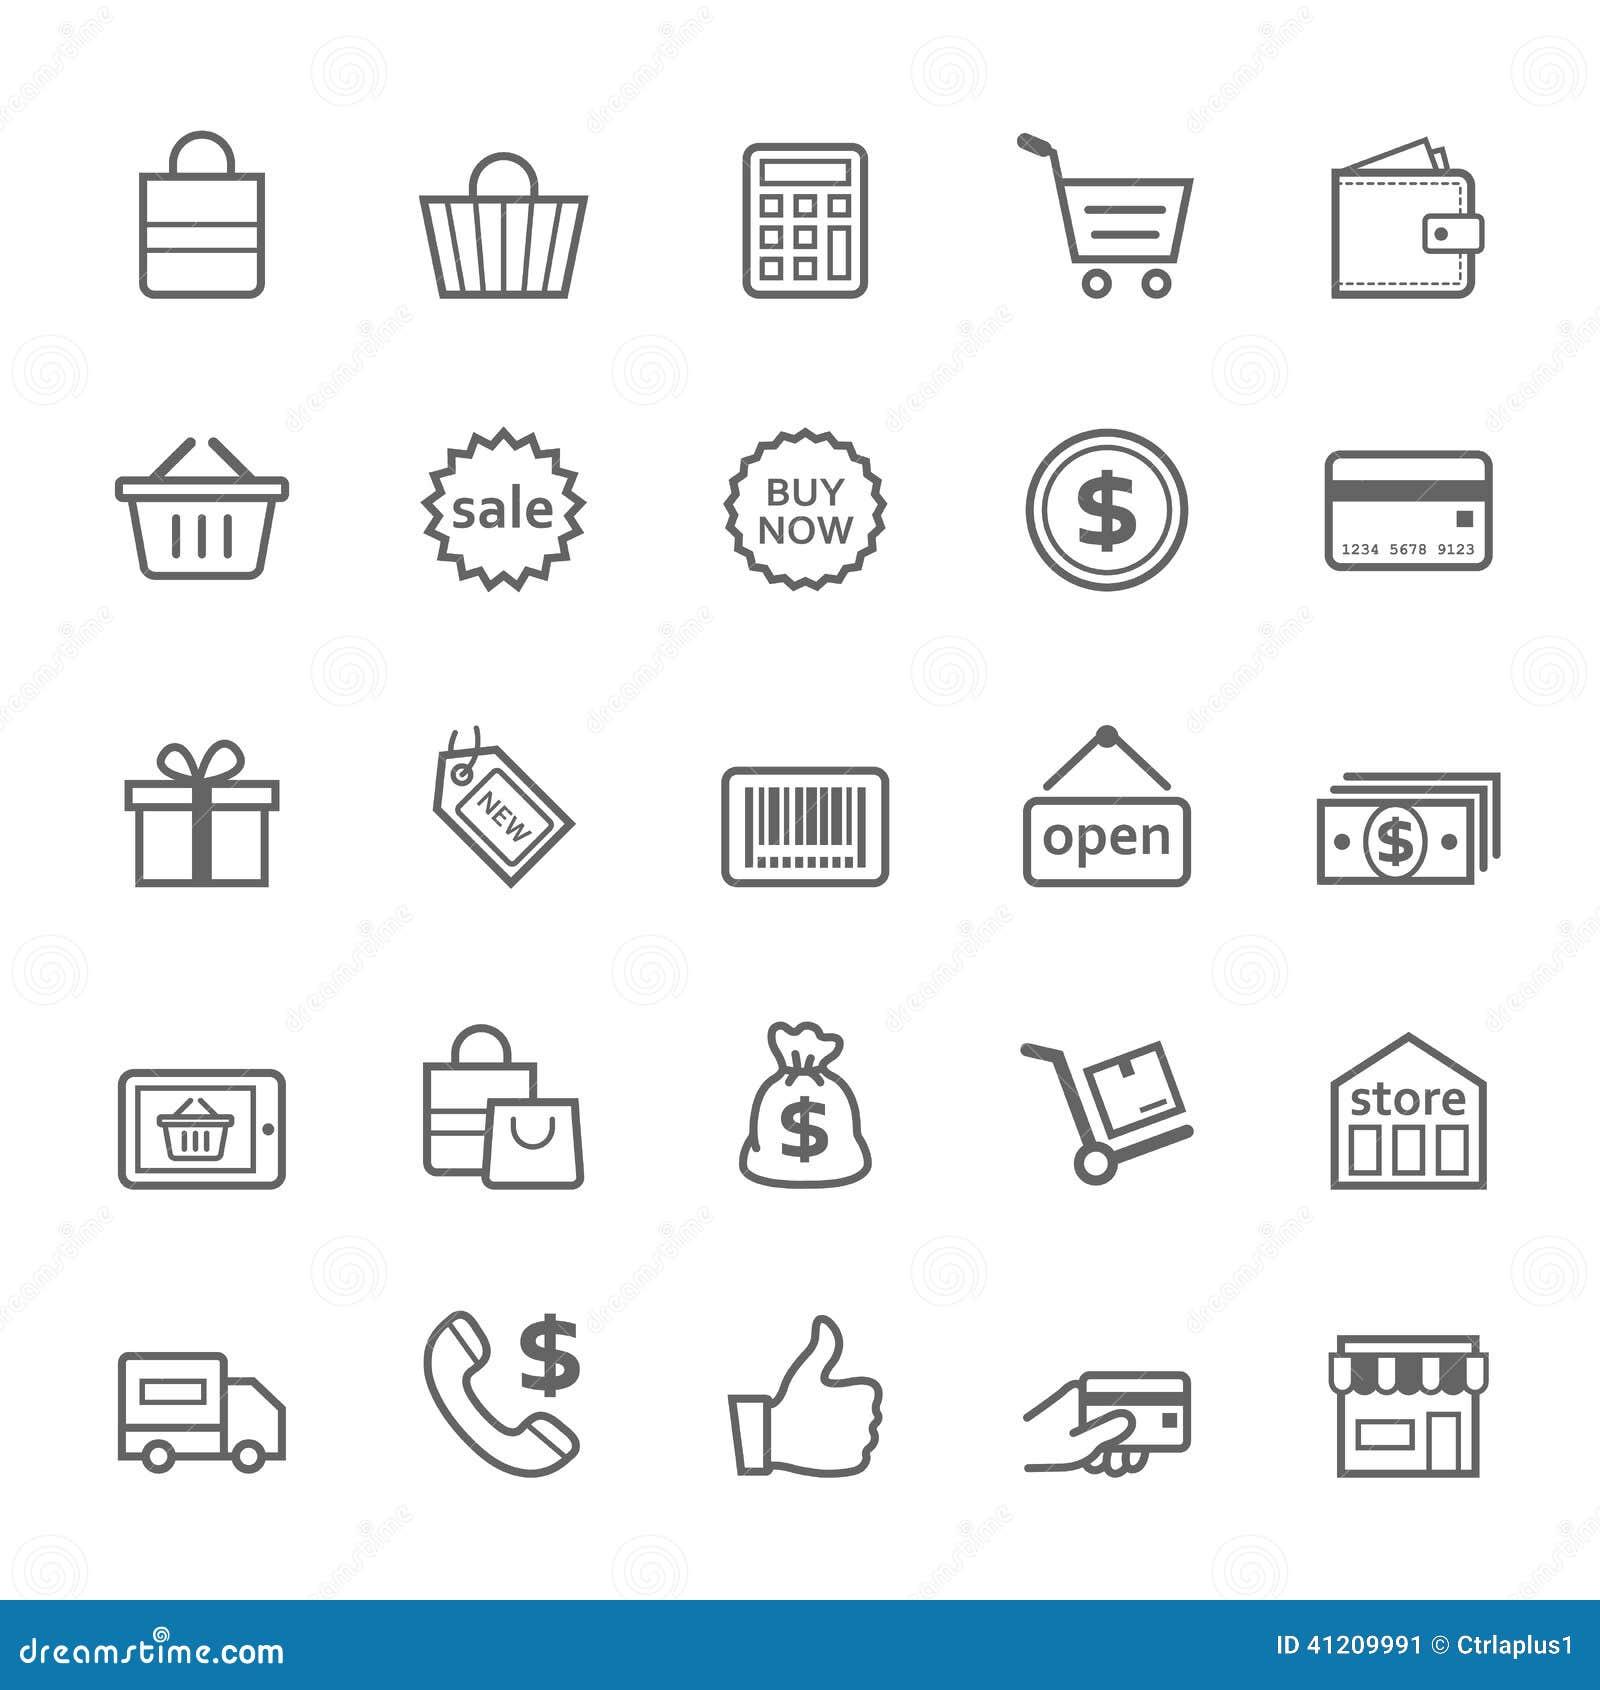 Set of Outline stroke Shopping icon